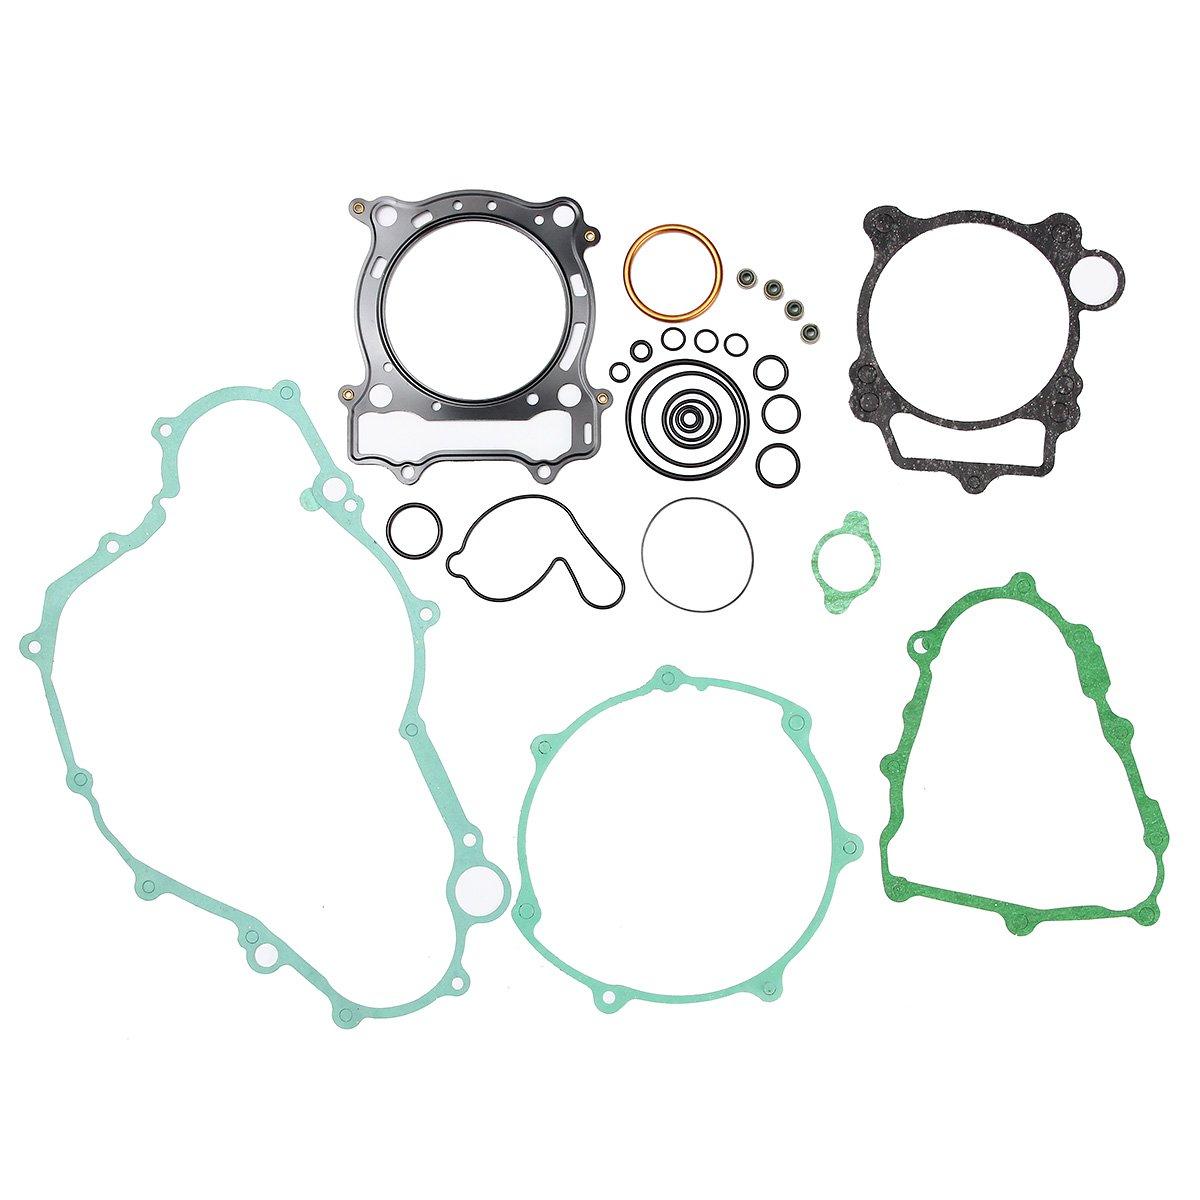 New Complete Engine Gaskets Kit Set For Yamaha YFZ450 YFZ 450 2004 2005 2006 2007 2008 2009